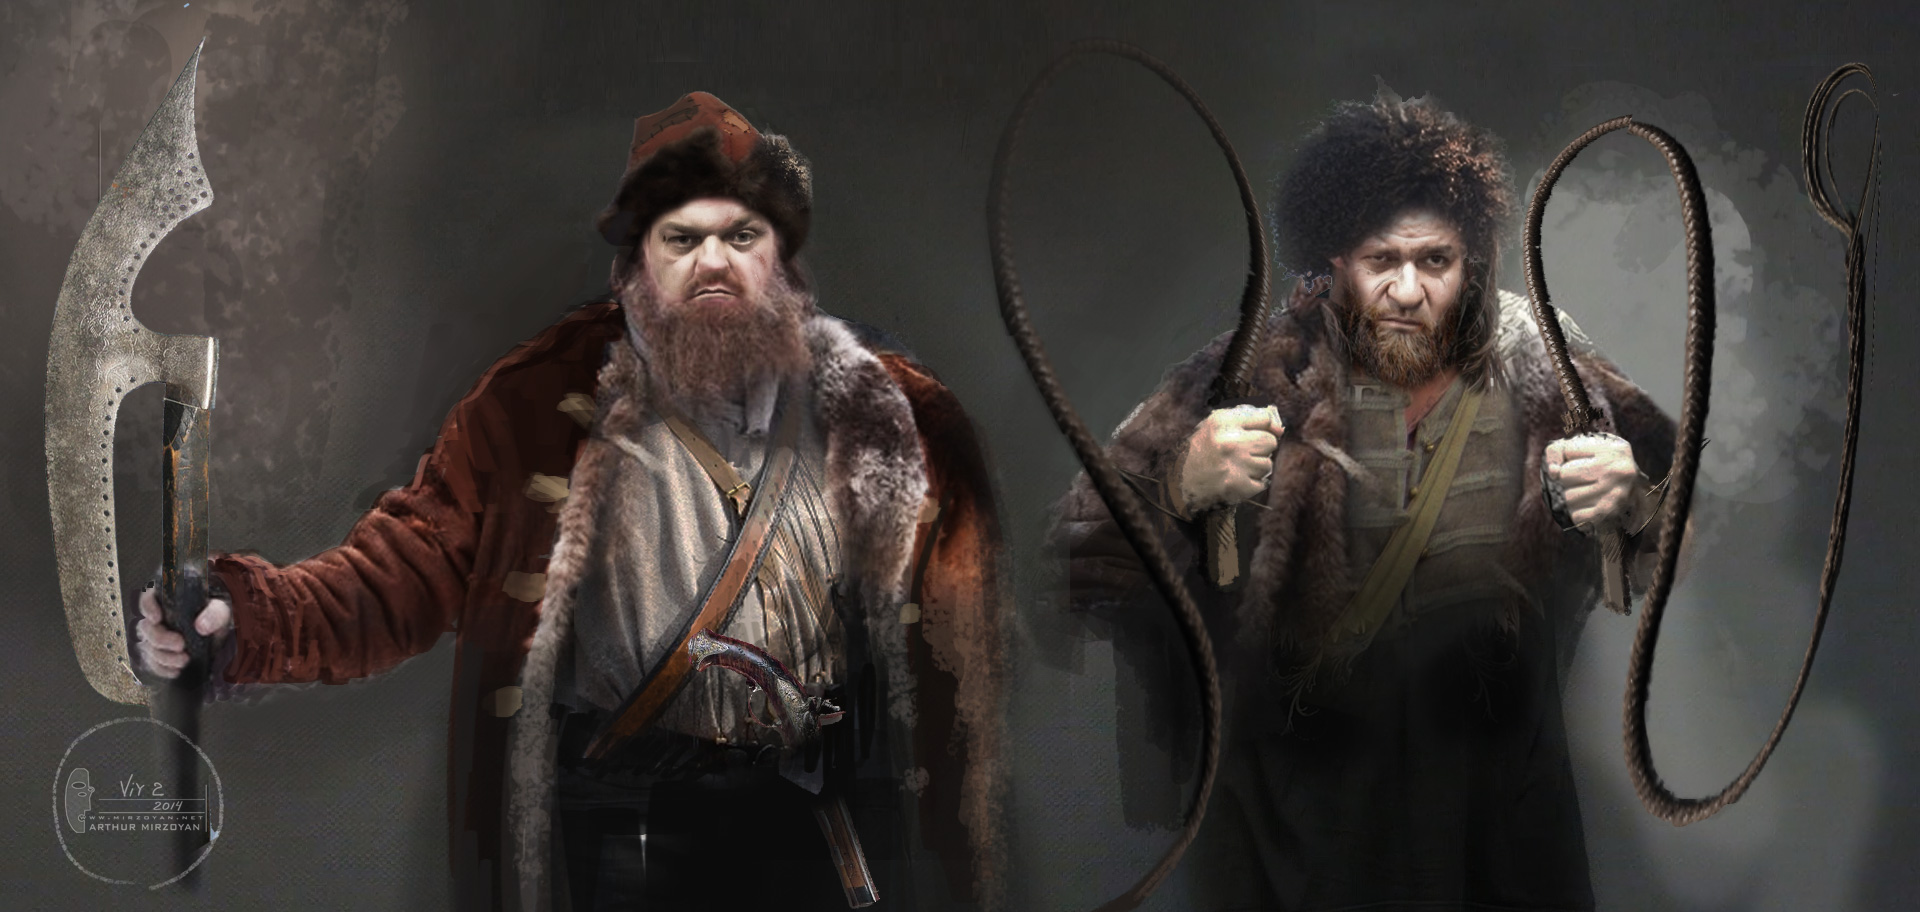 концепт-арты Тайна печати дракона Михаил Мухин, Вилен Бабичев,